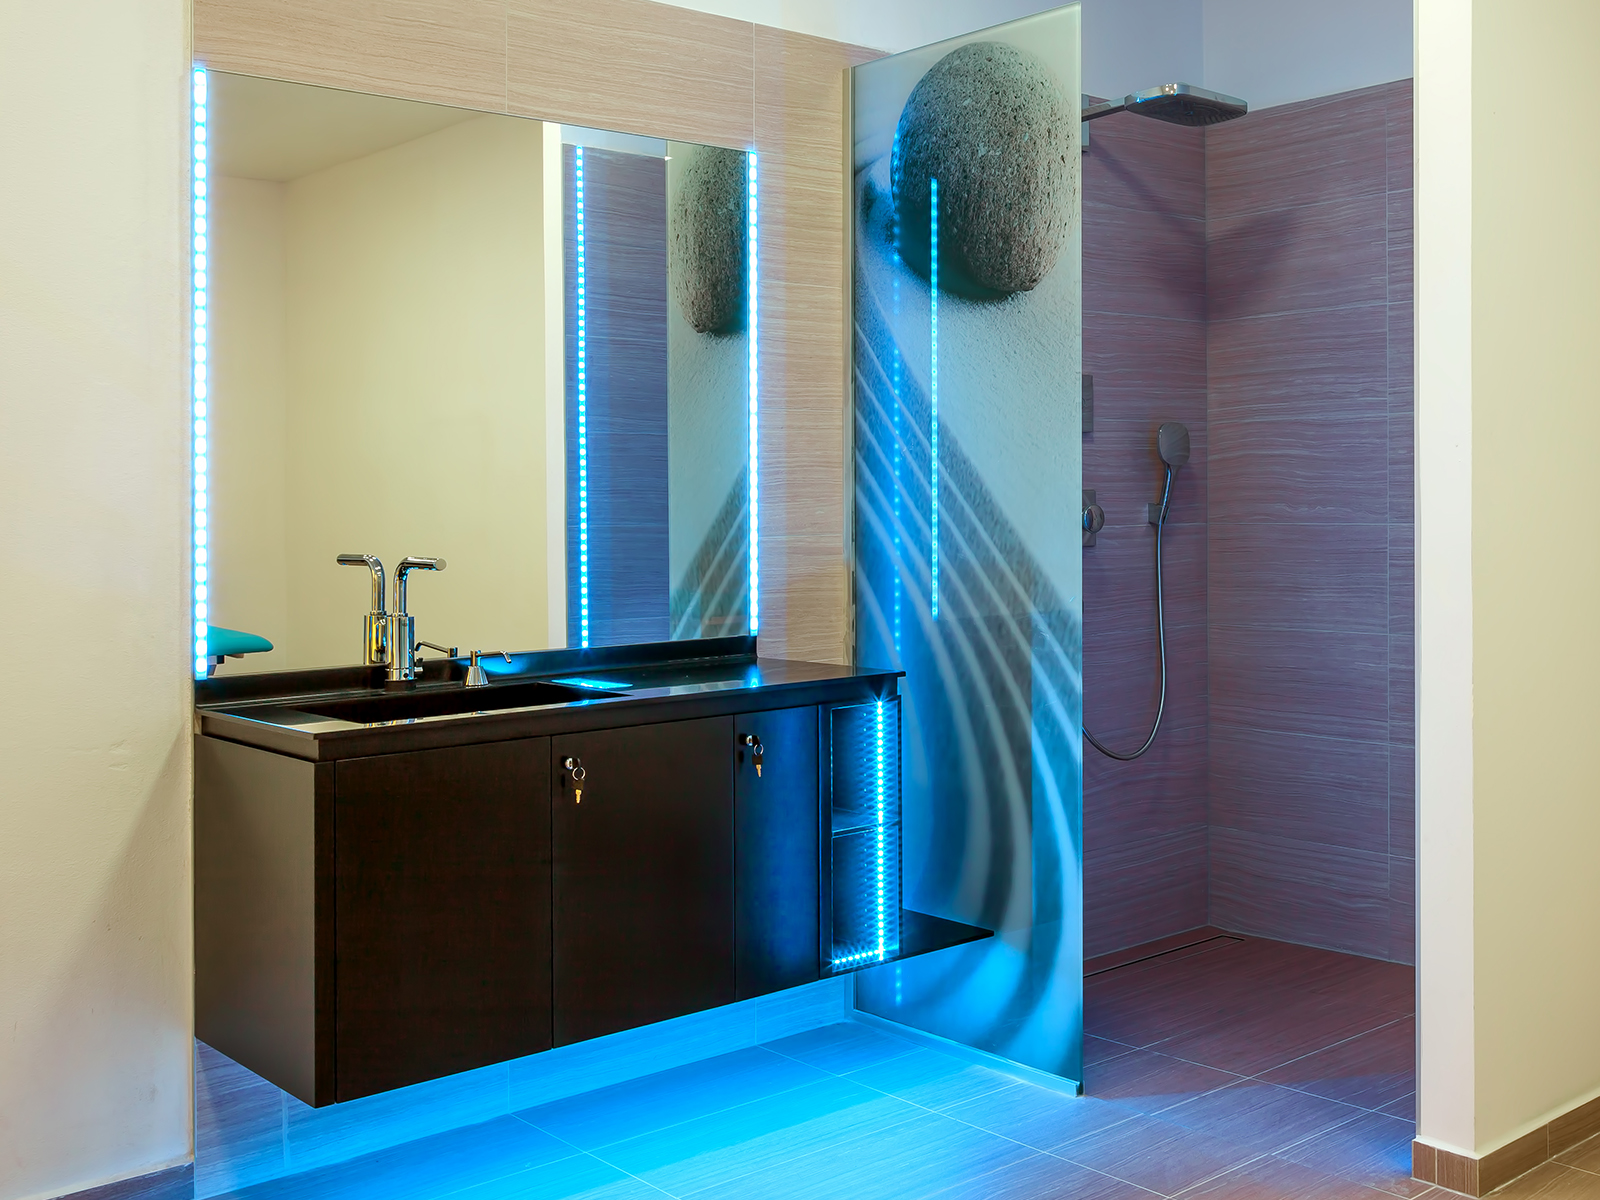 Sklo s potiskem Image Glass-skleněné prvky v interiéru, exteriéru